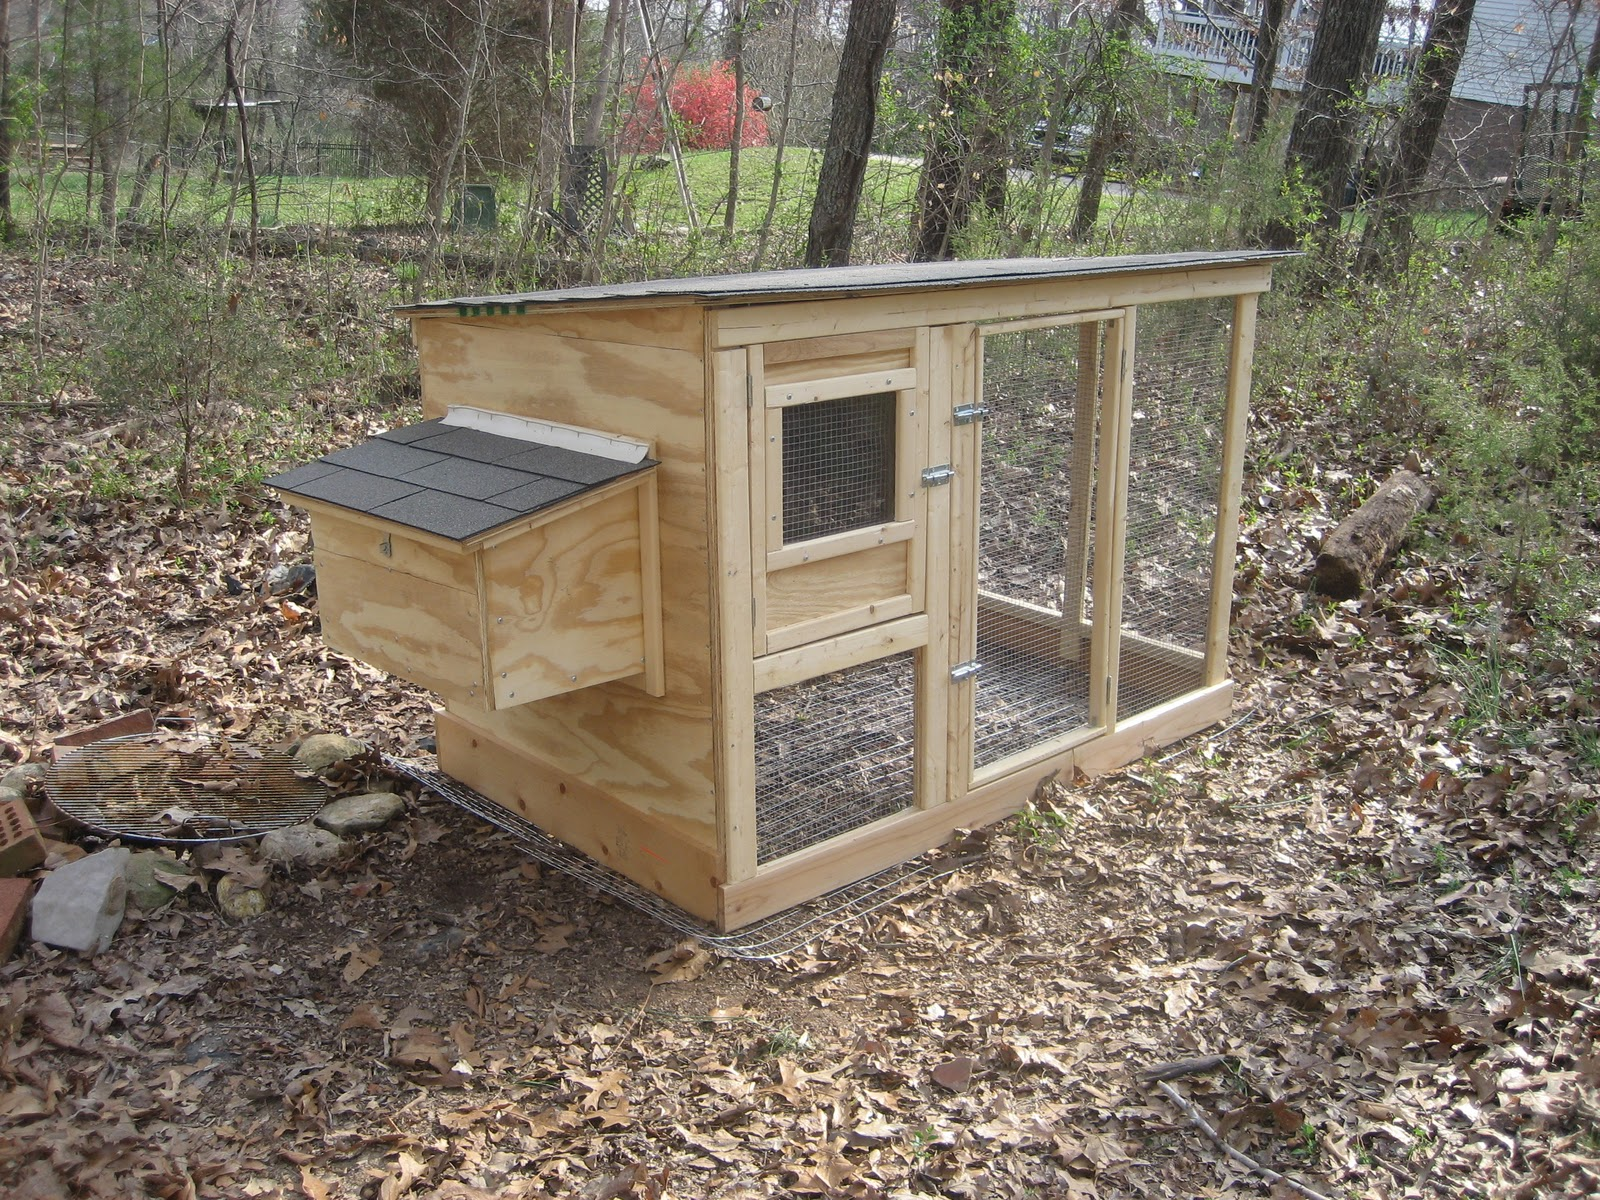 Backyard Farming: A Look at a Coop